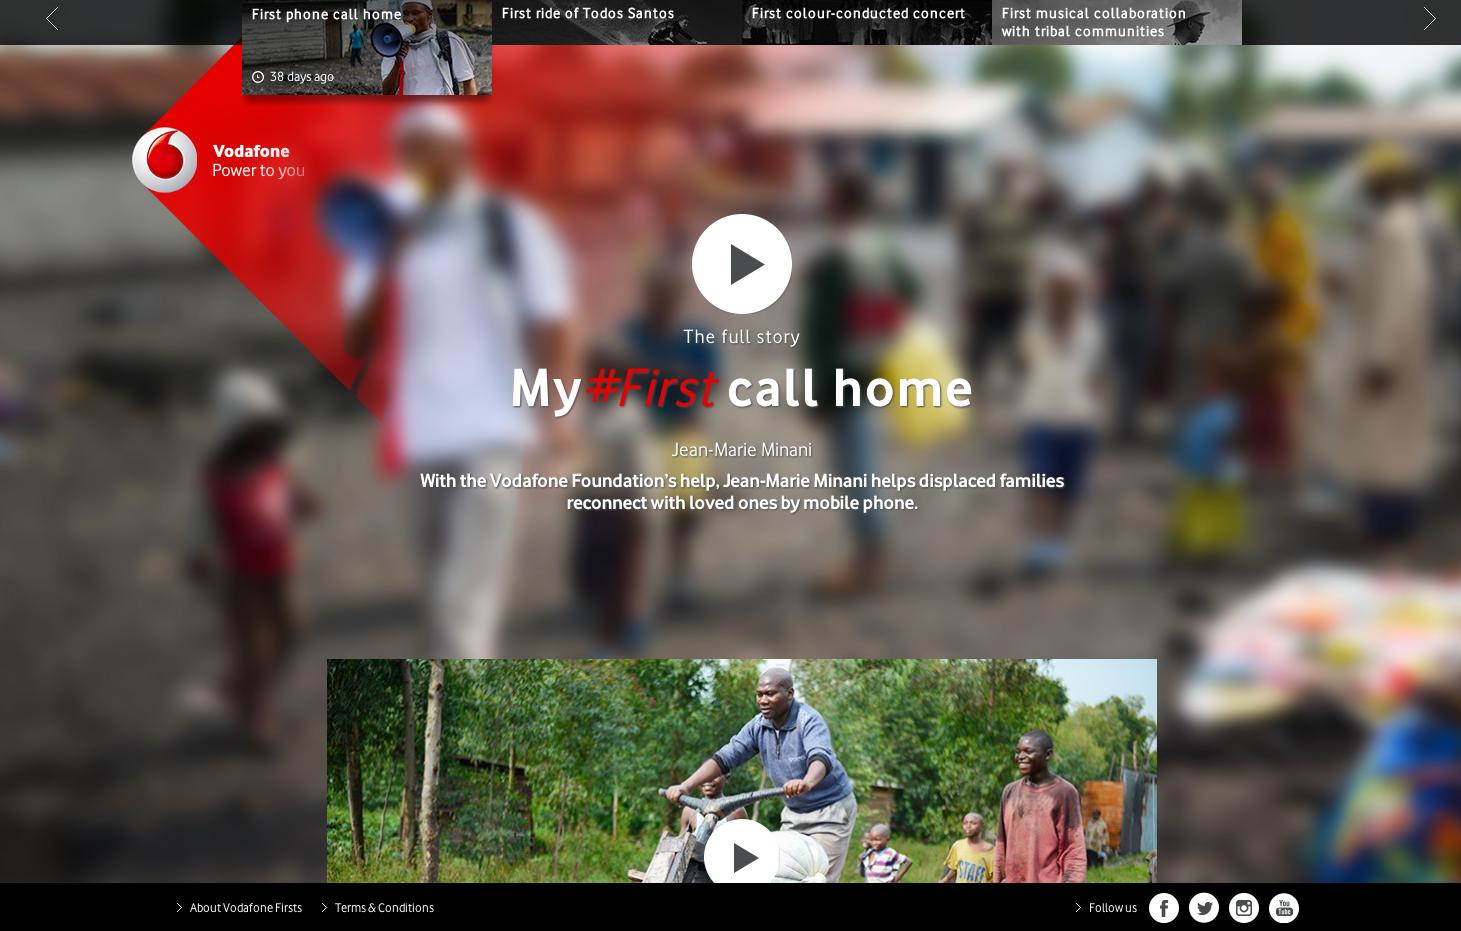 Vodafone's campaign landing page